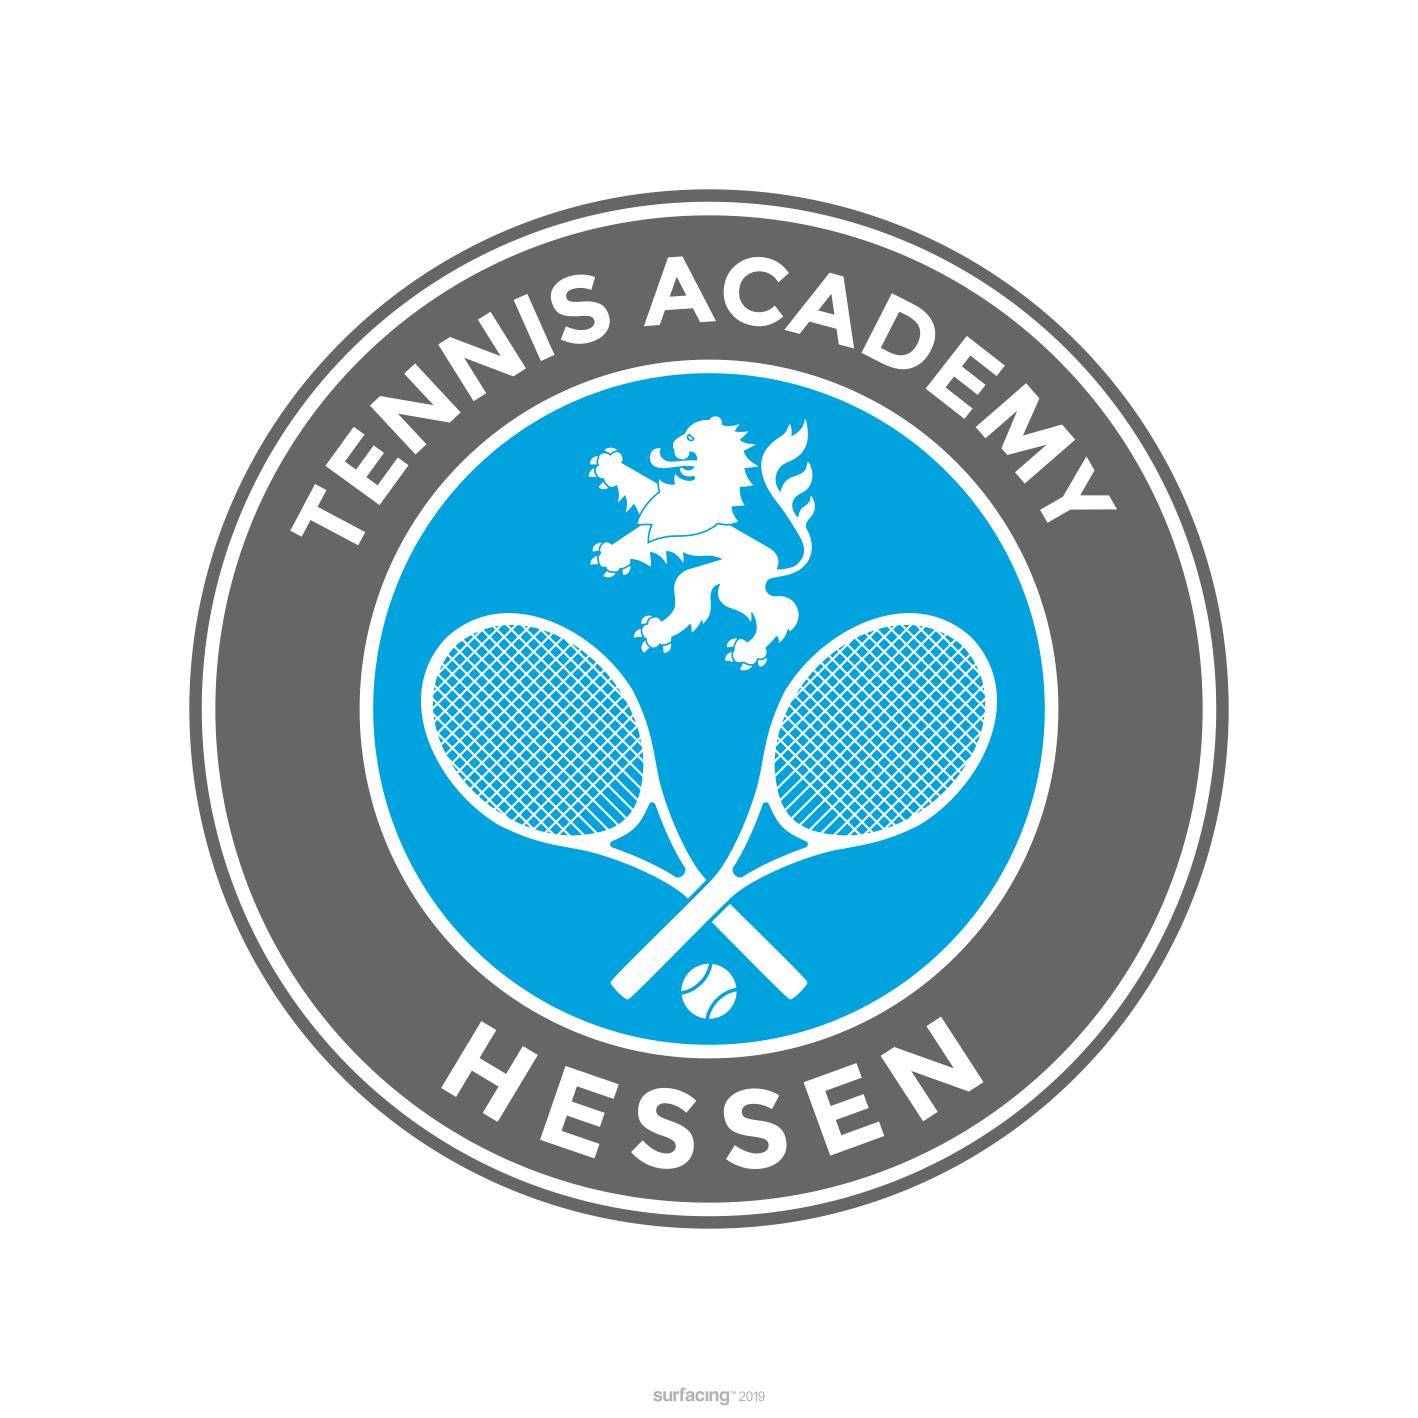 LOGO for Tennis Academy